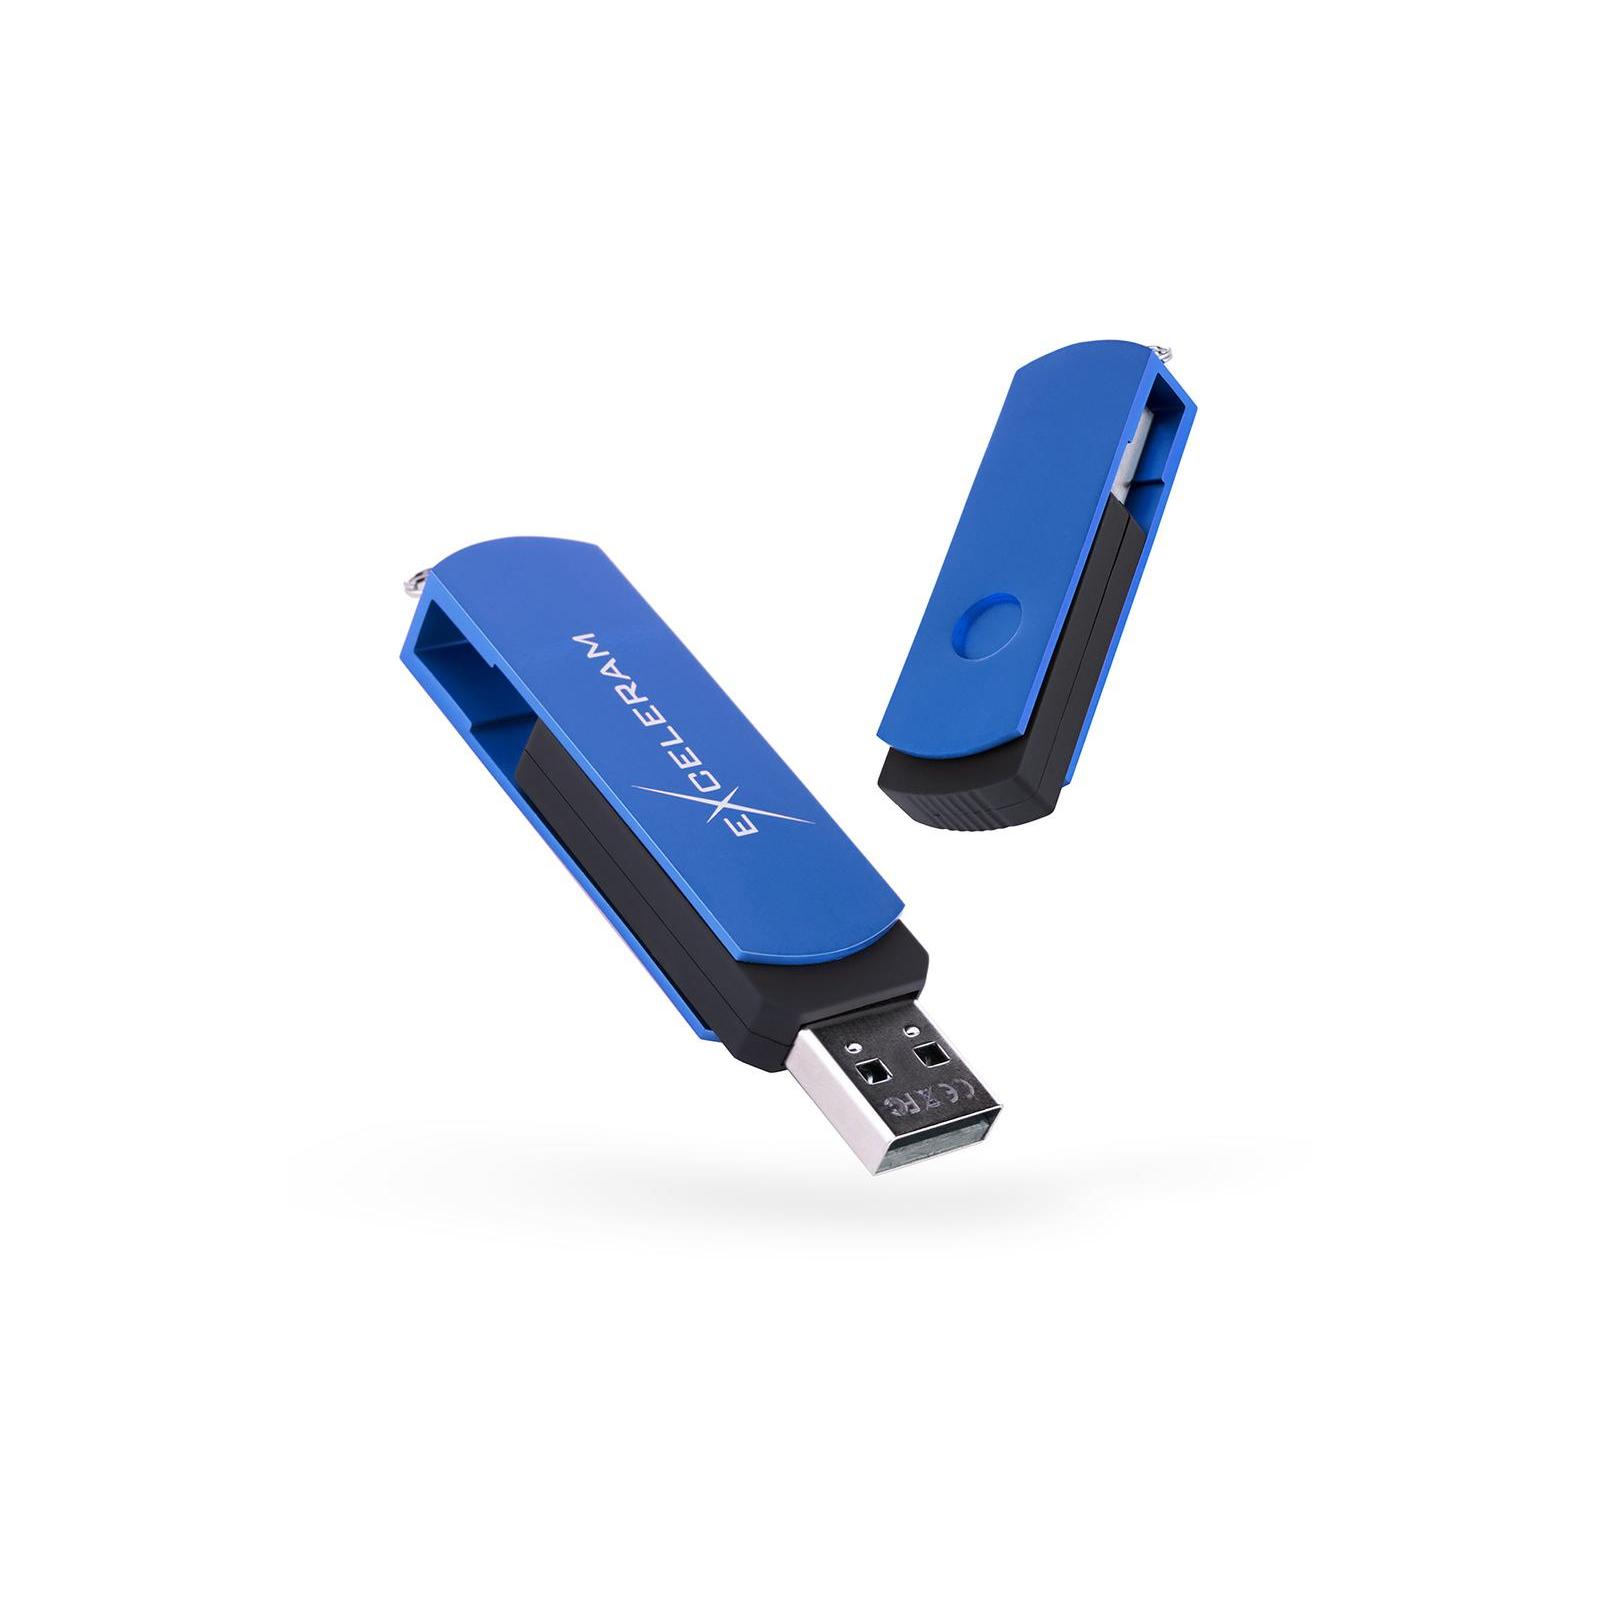 USB флеш накопитель eXceleram 32GB P2 Series Blue/Black USB 3.1 Gen 1 (EXP2U3BLB32)